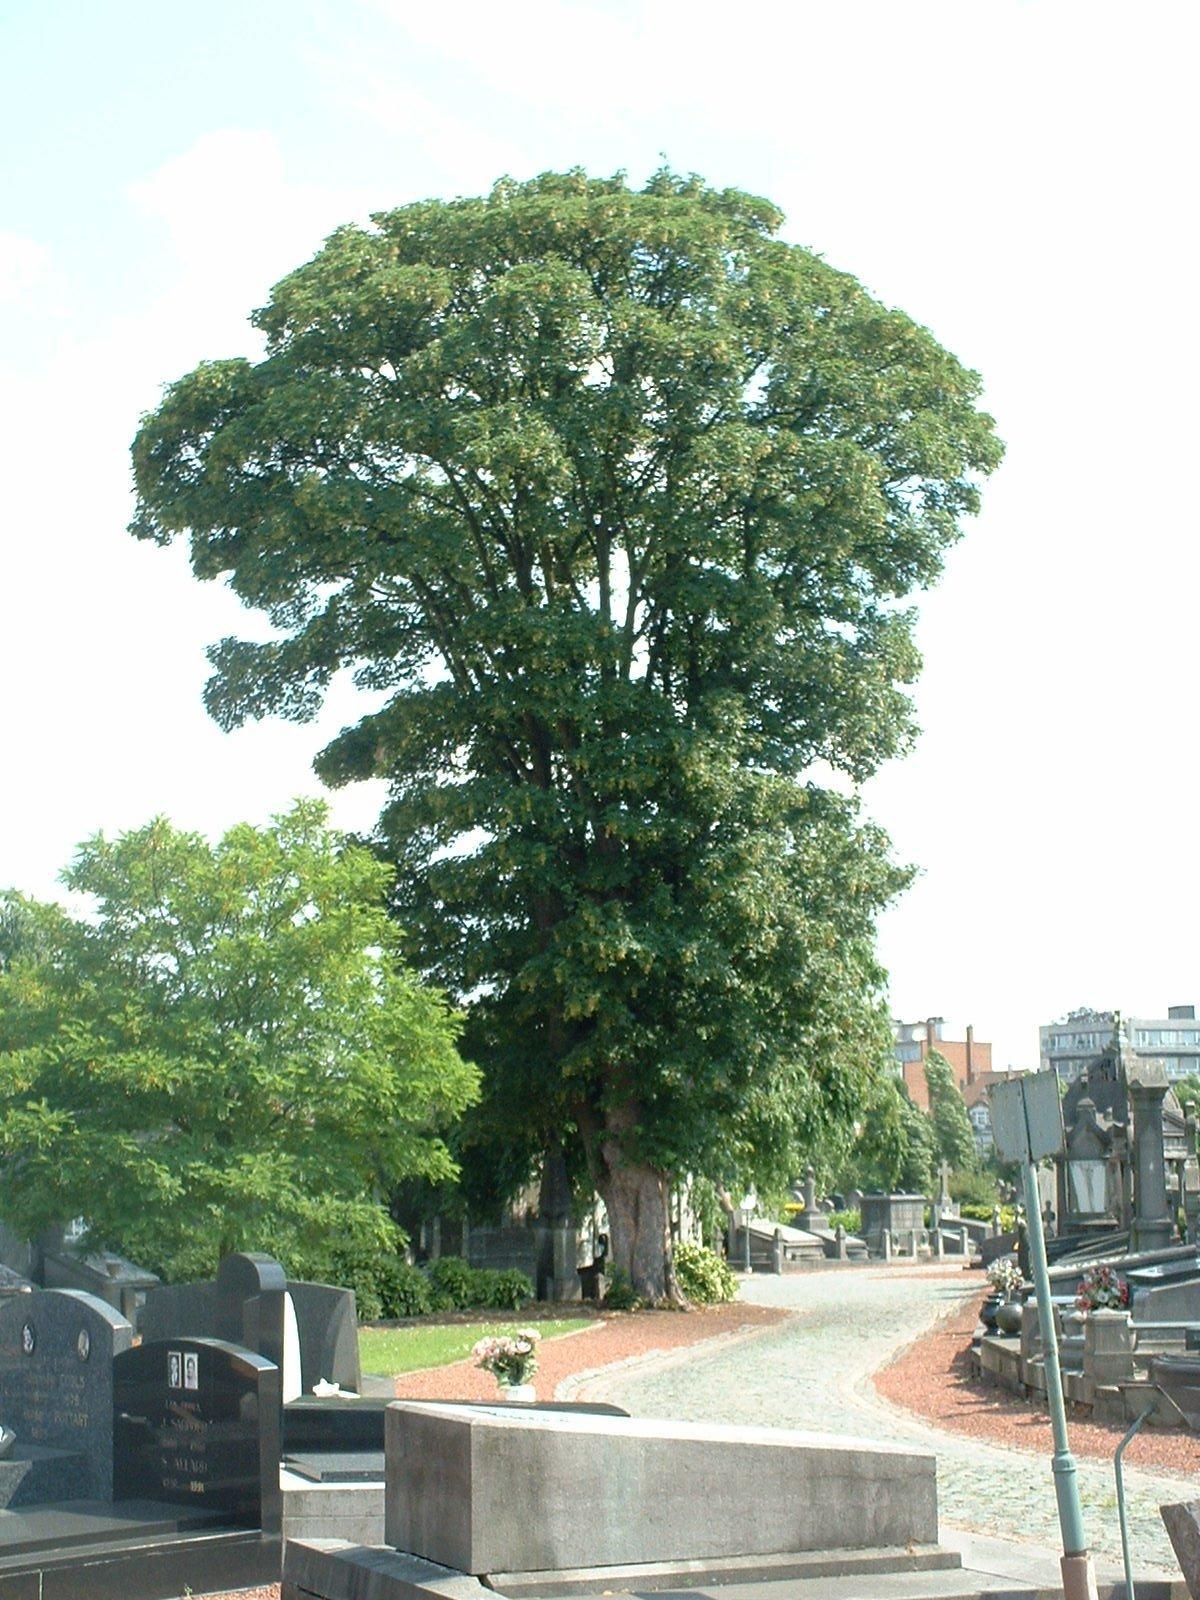 Acer pseudoplatanus 'Erectum' – Molenbeek-Saint-Jean, Cimetière de Molenbeek-Saint-Jean, cimetière –  28 Juin 2004